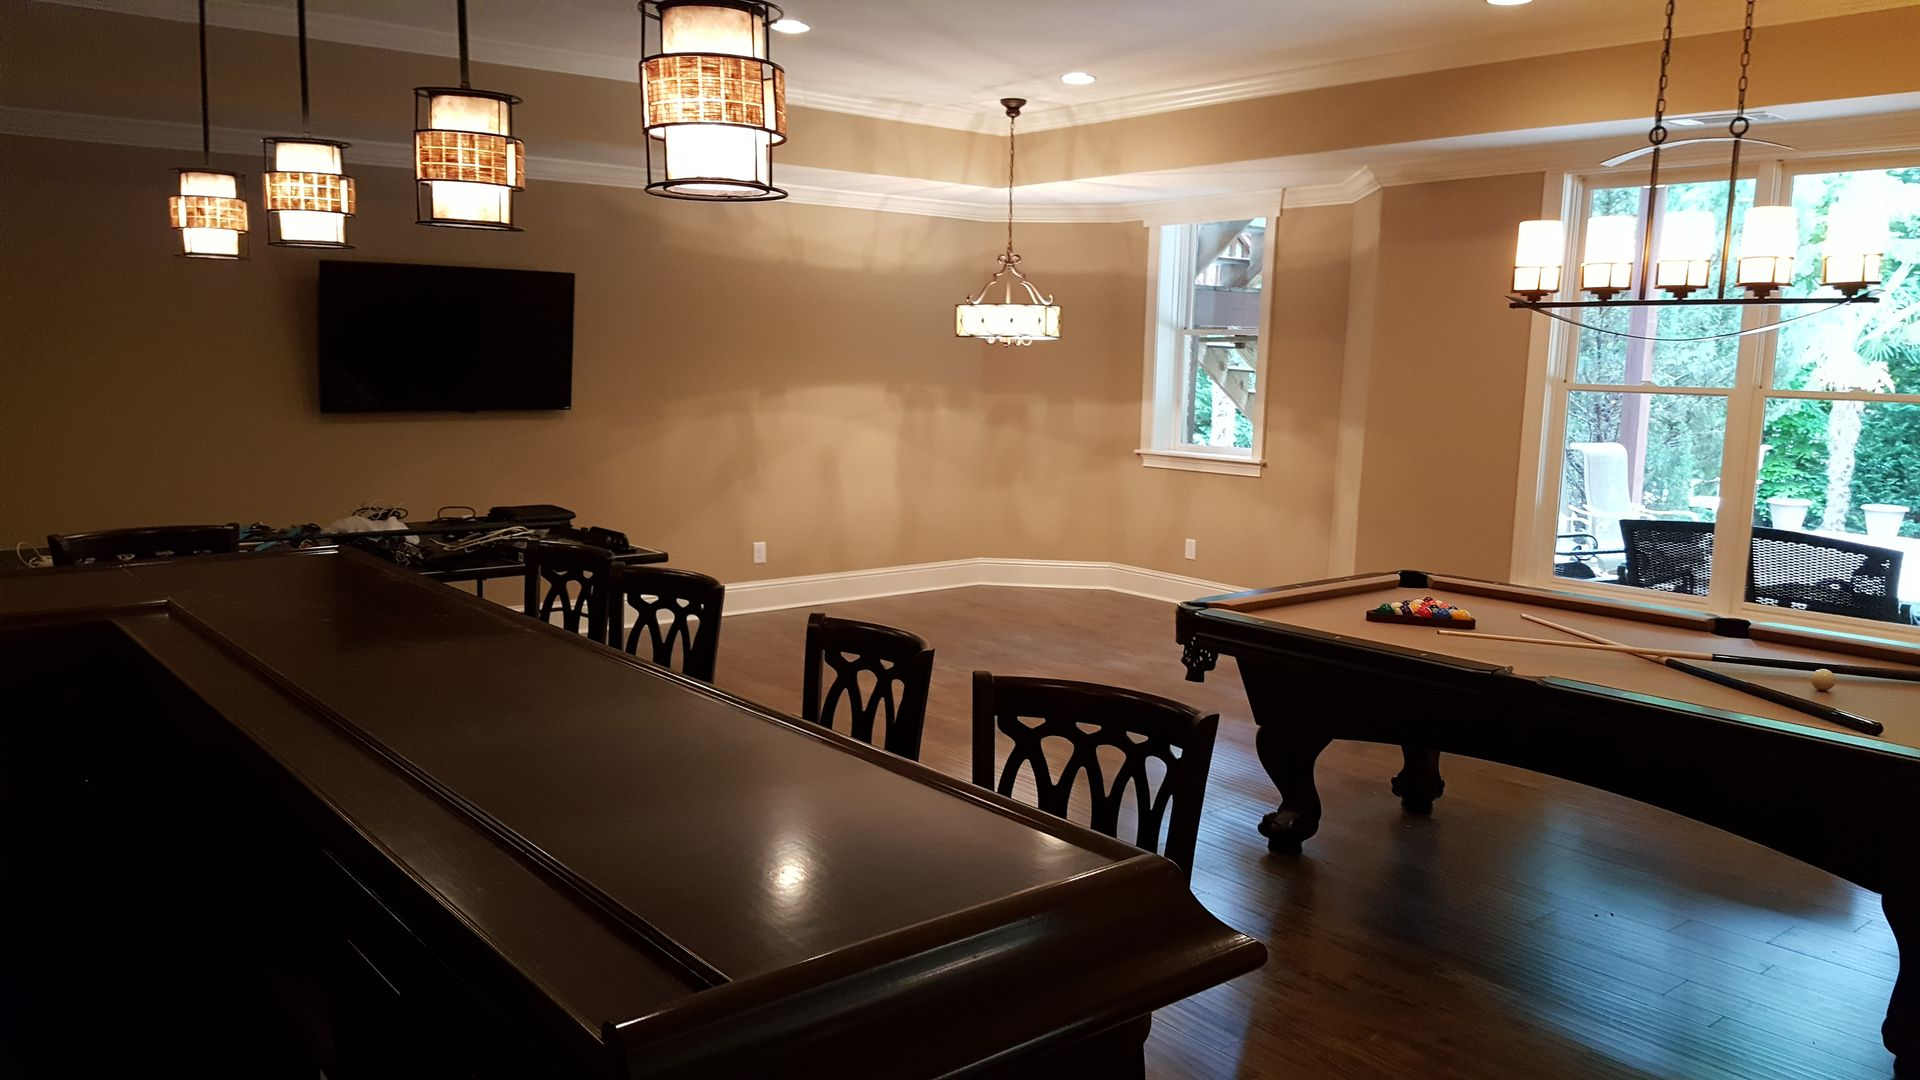 Atlanta Basements Decks Basement Finishing Home Remodeling Basement Remodel Diy Home Remodeling Basement Floor Plans